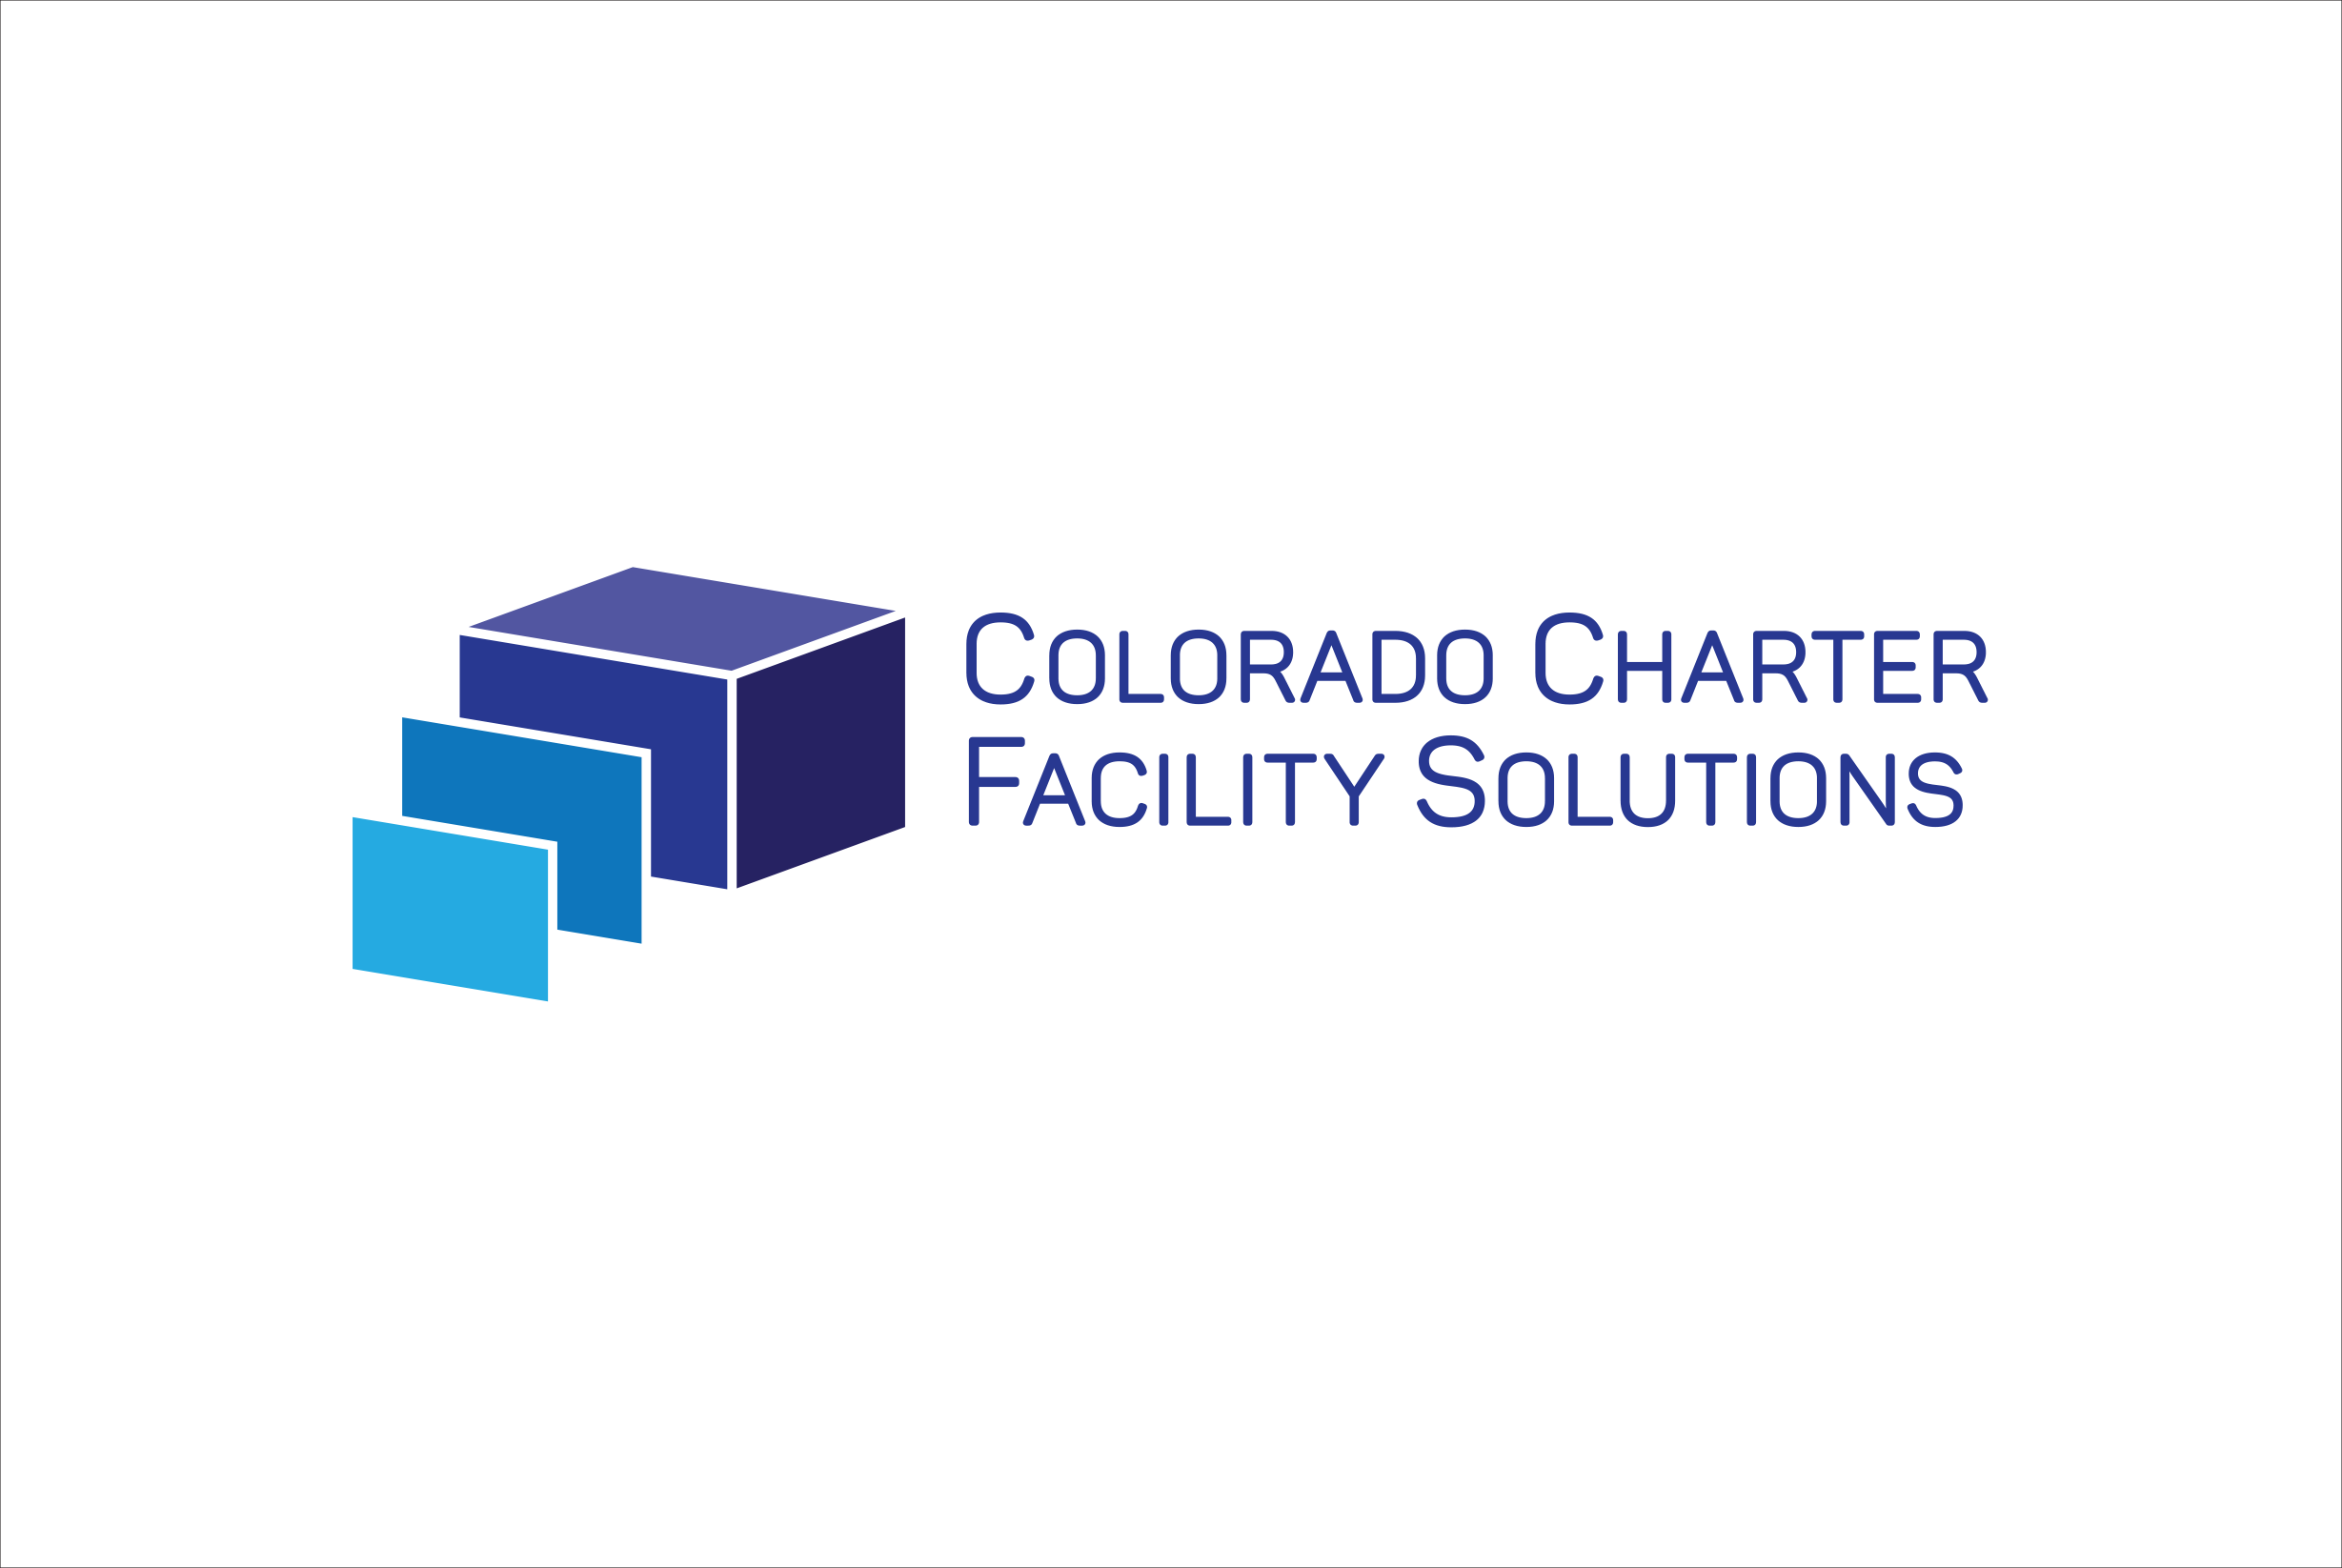 Colorado Charter Facility Solutions